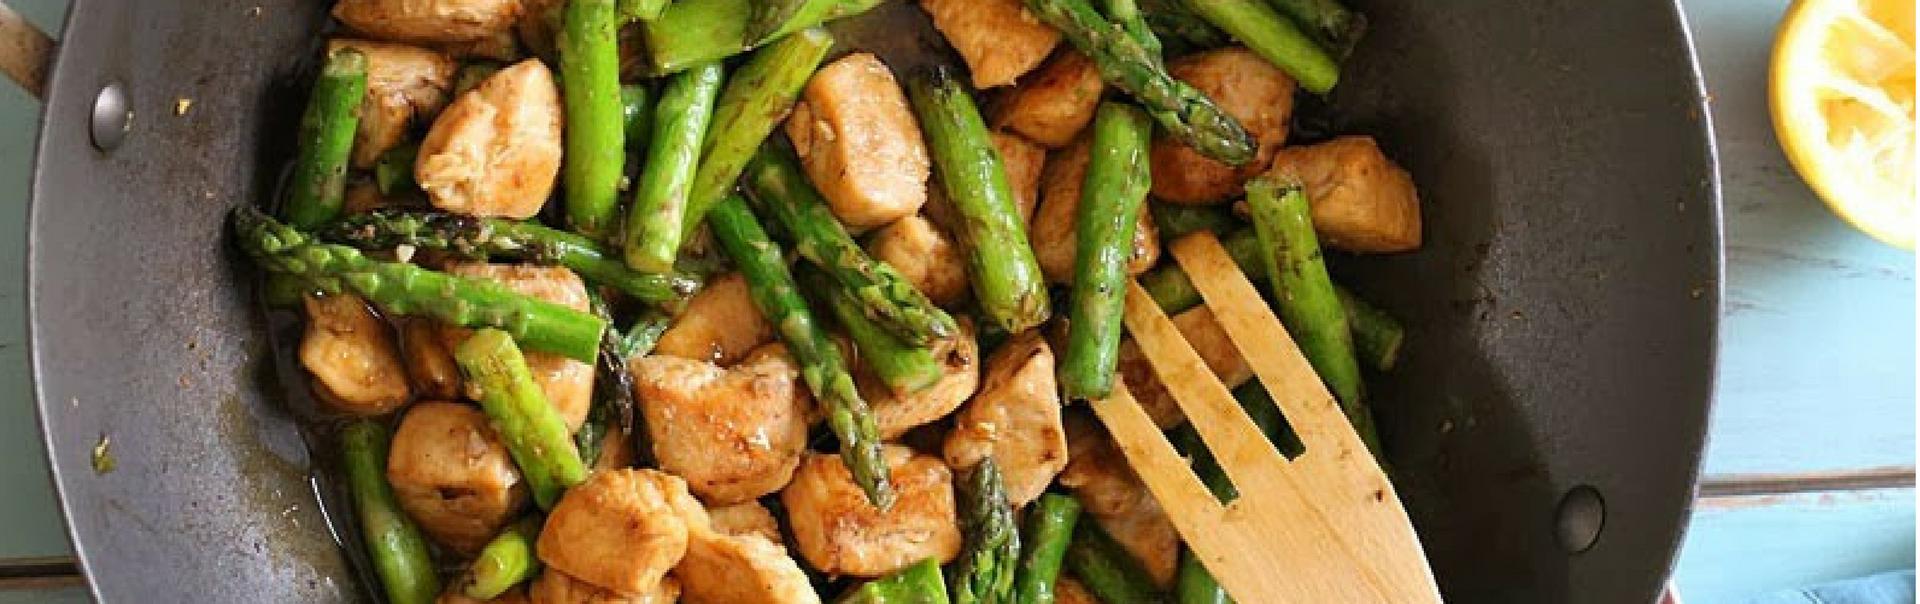 Chicken and Asparagus Lemon Stir Fry